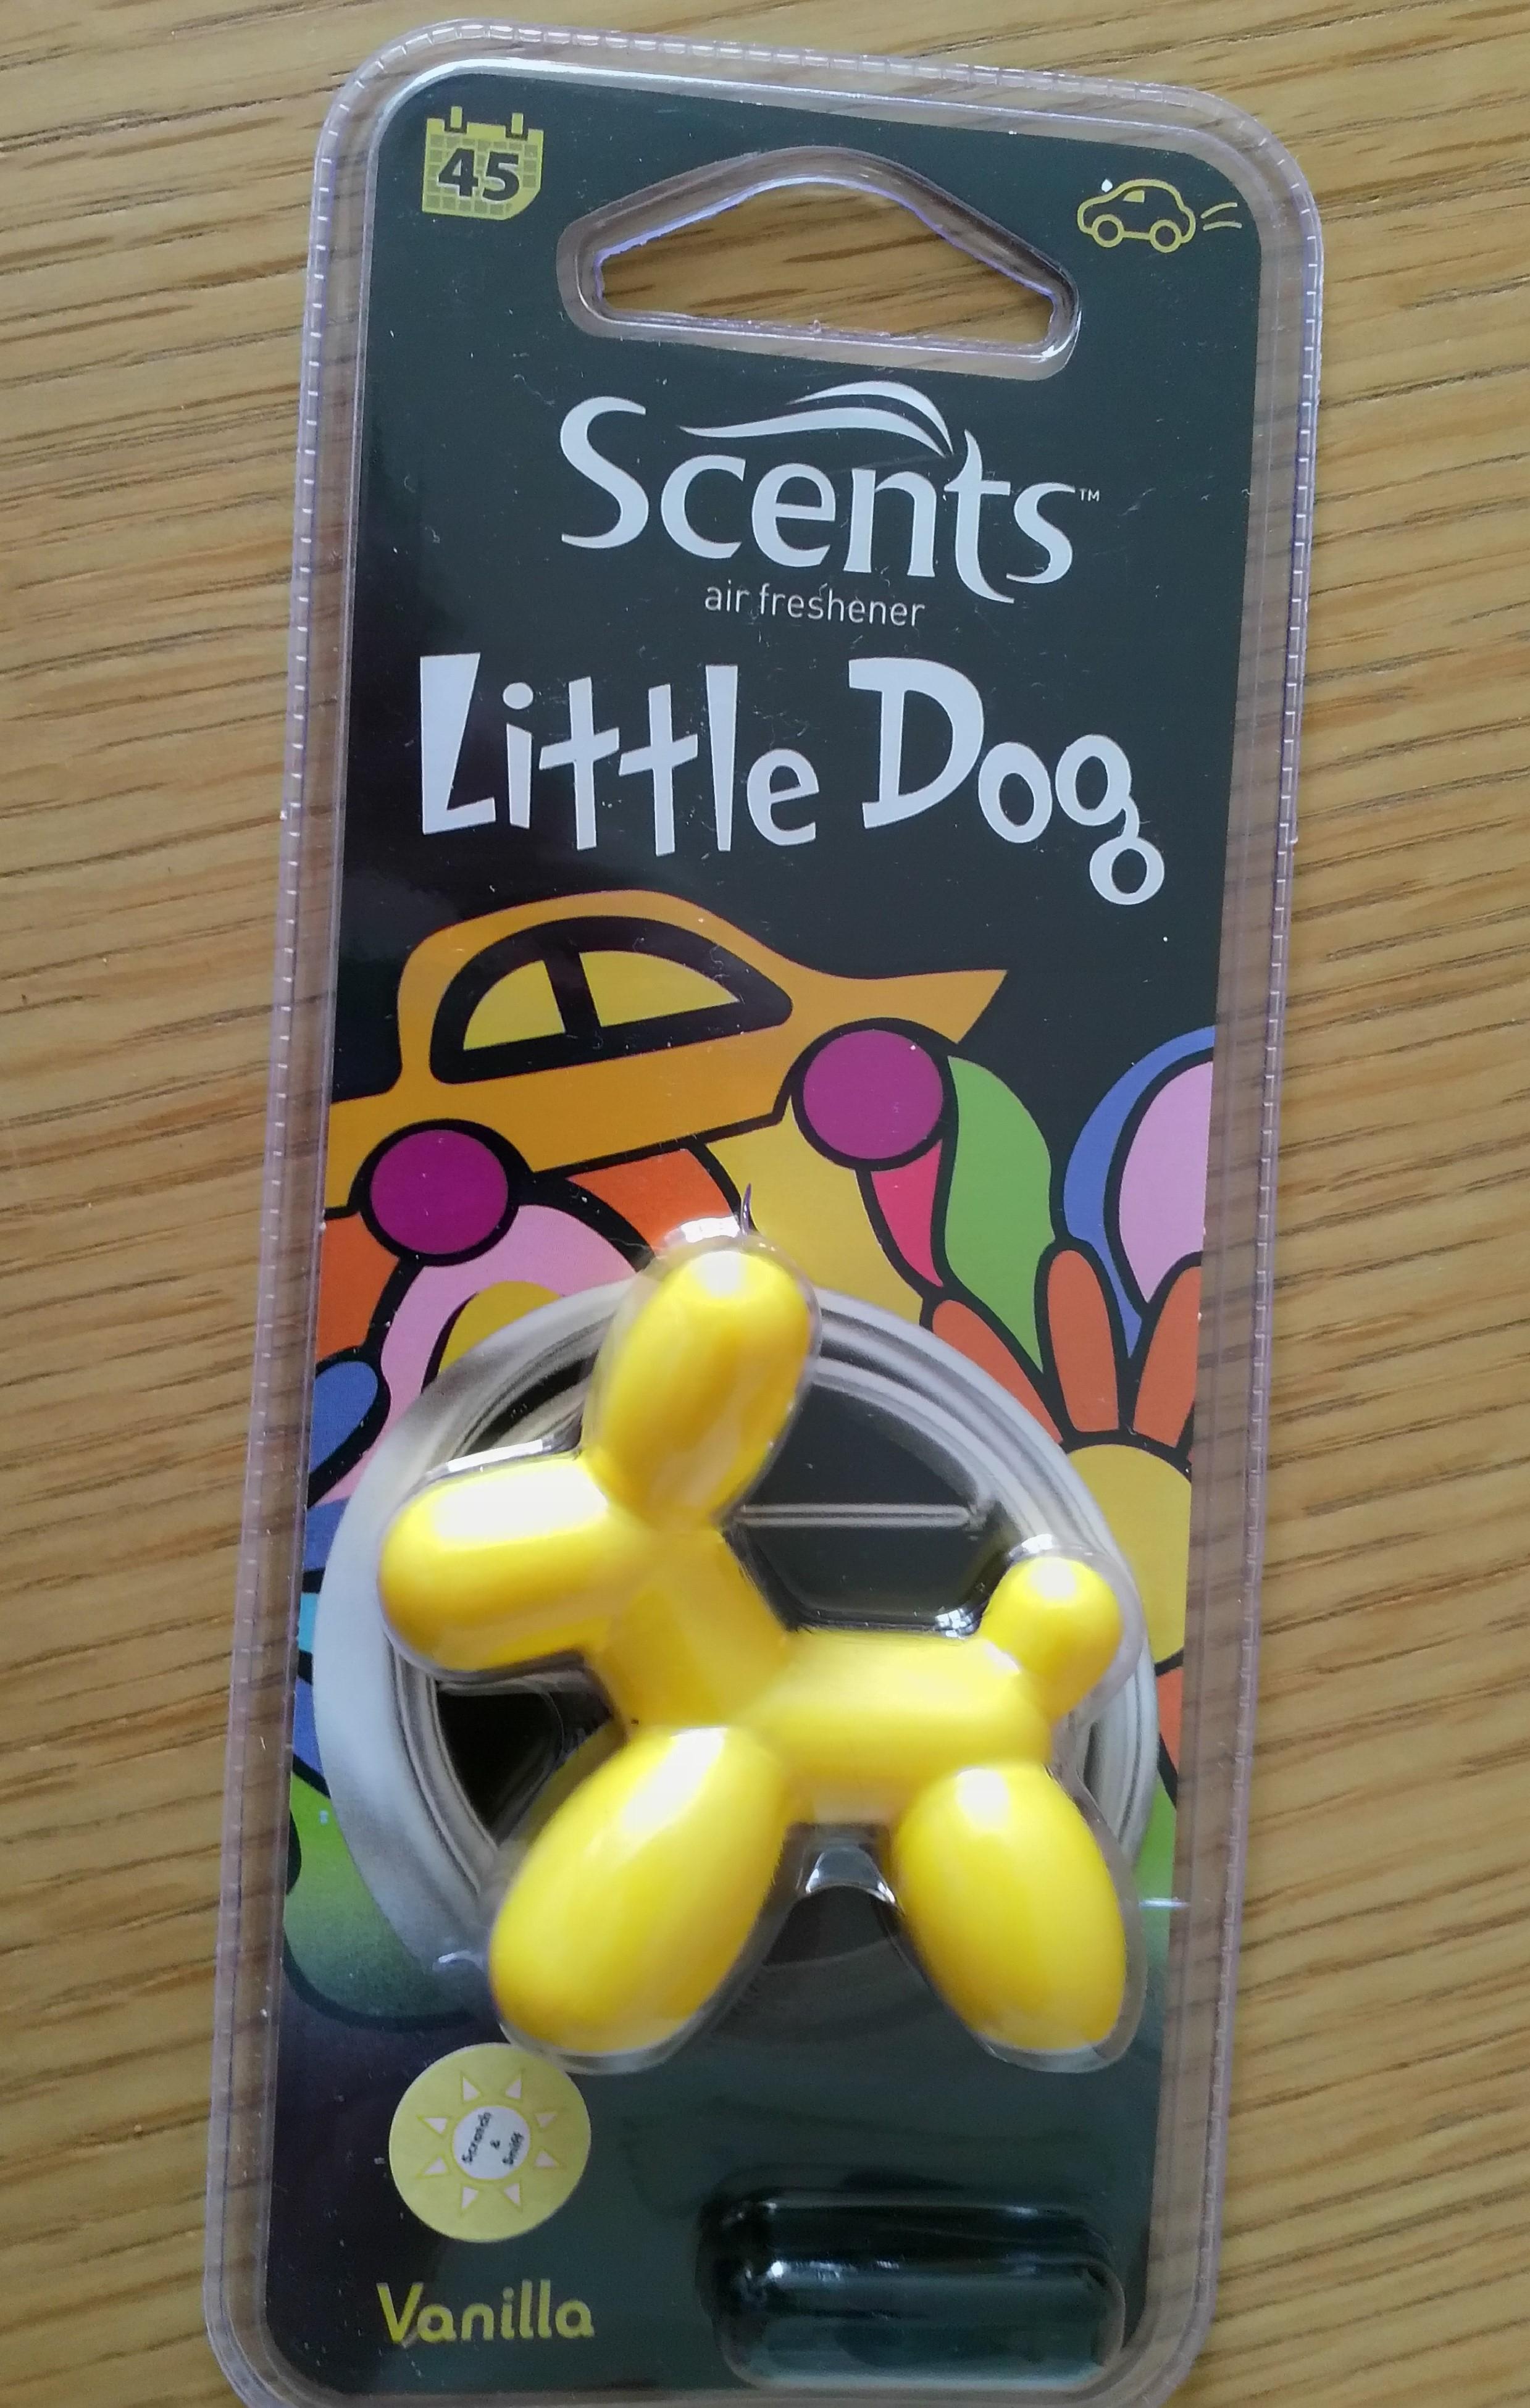 Scents Little Dog vanilla car air freshener 34p at ASDA